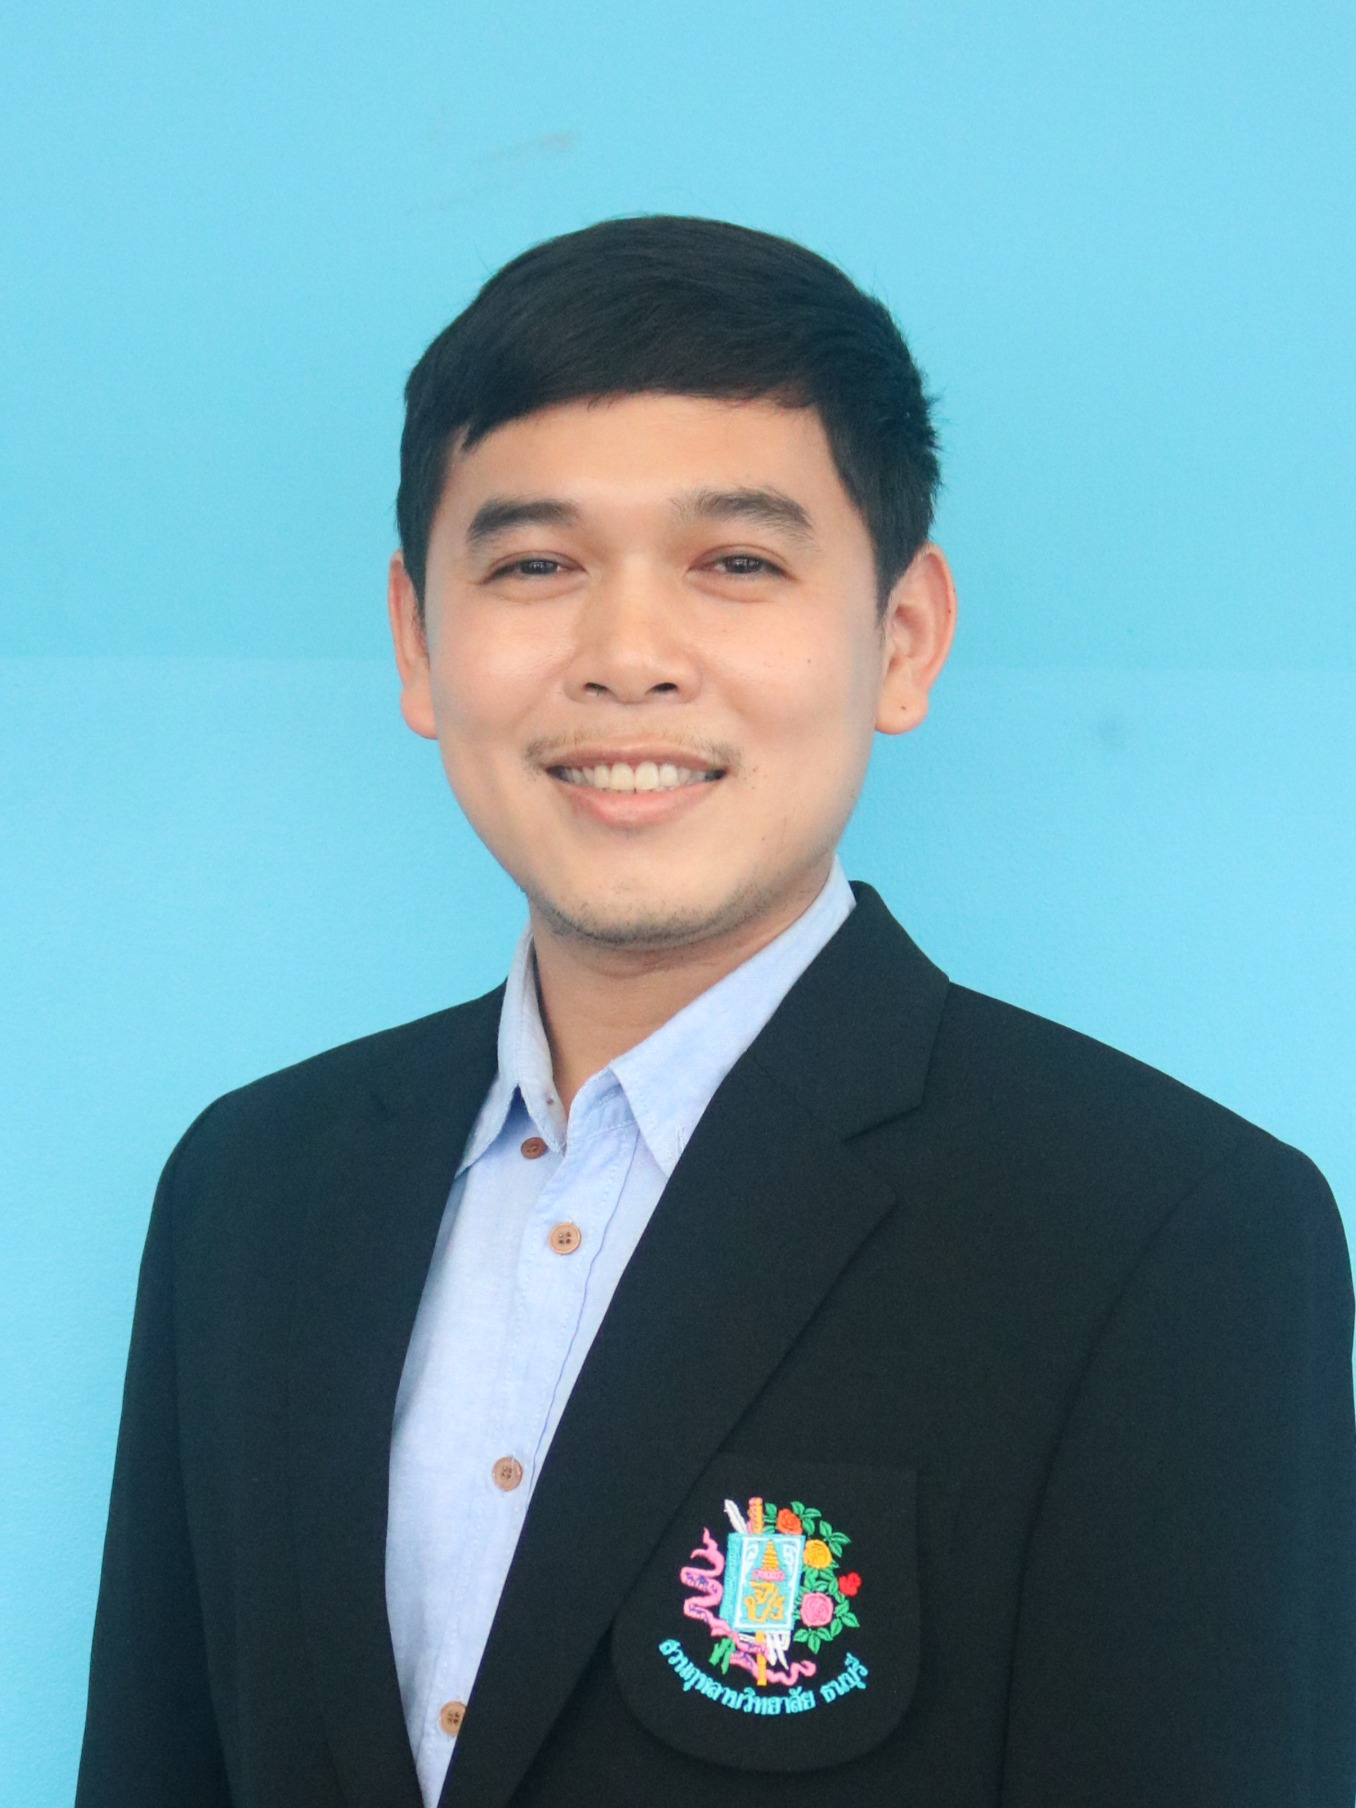 Mr. Thanarwut Photia